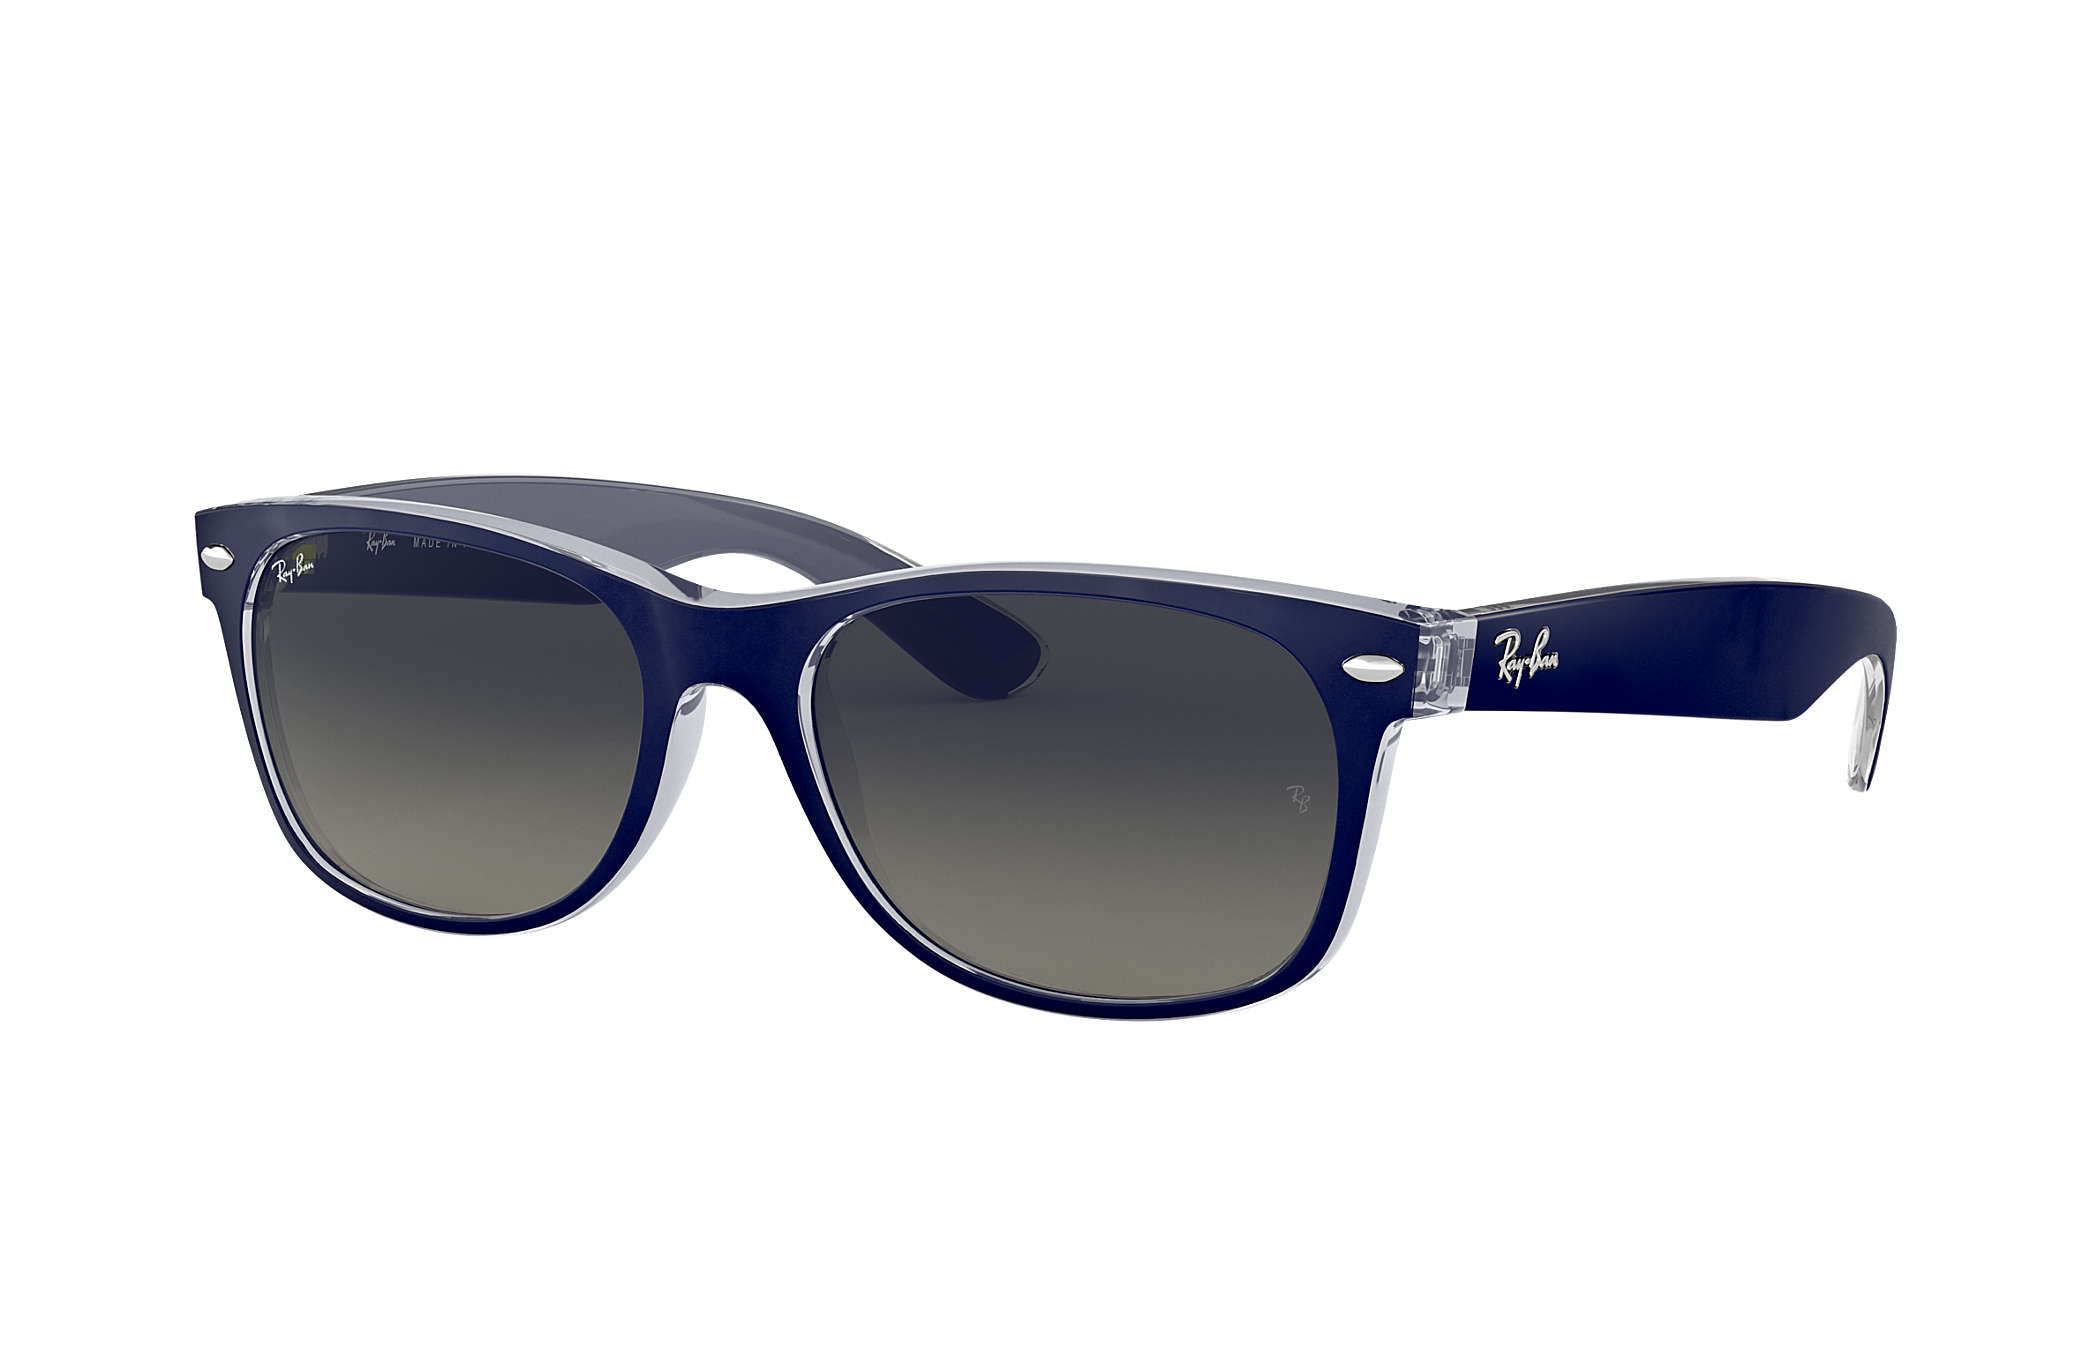 07af7e22eda55 Ray-Ban New Wayfarer Color Mix RB2132 Azul - Nylon - Lentes Cinzento ...